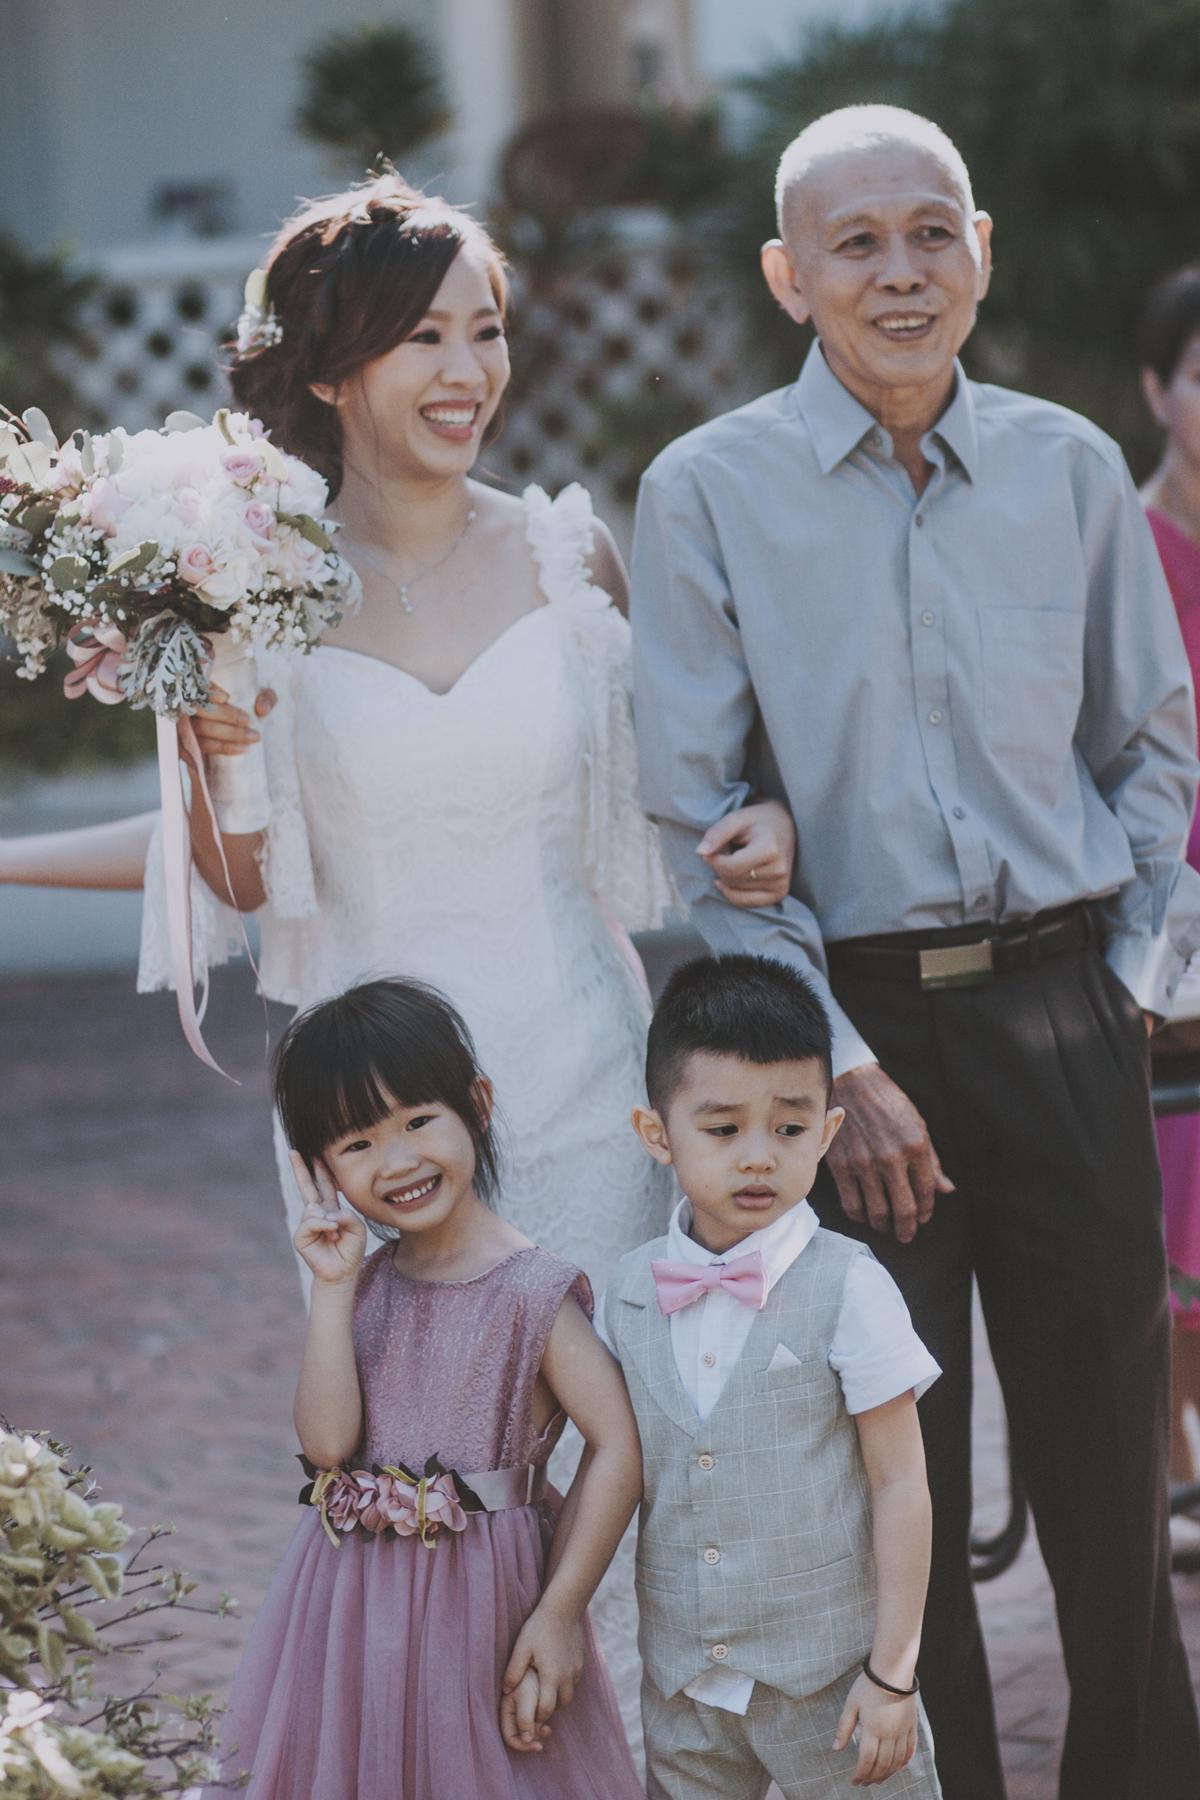 ROM wedding Photography at STG